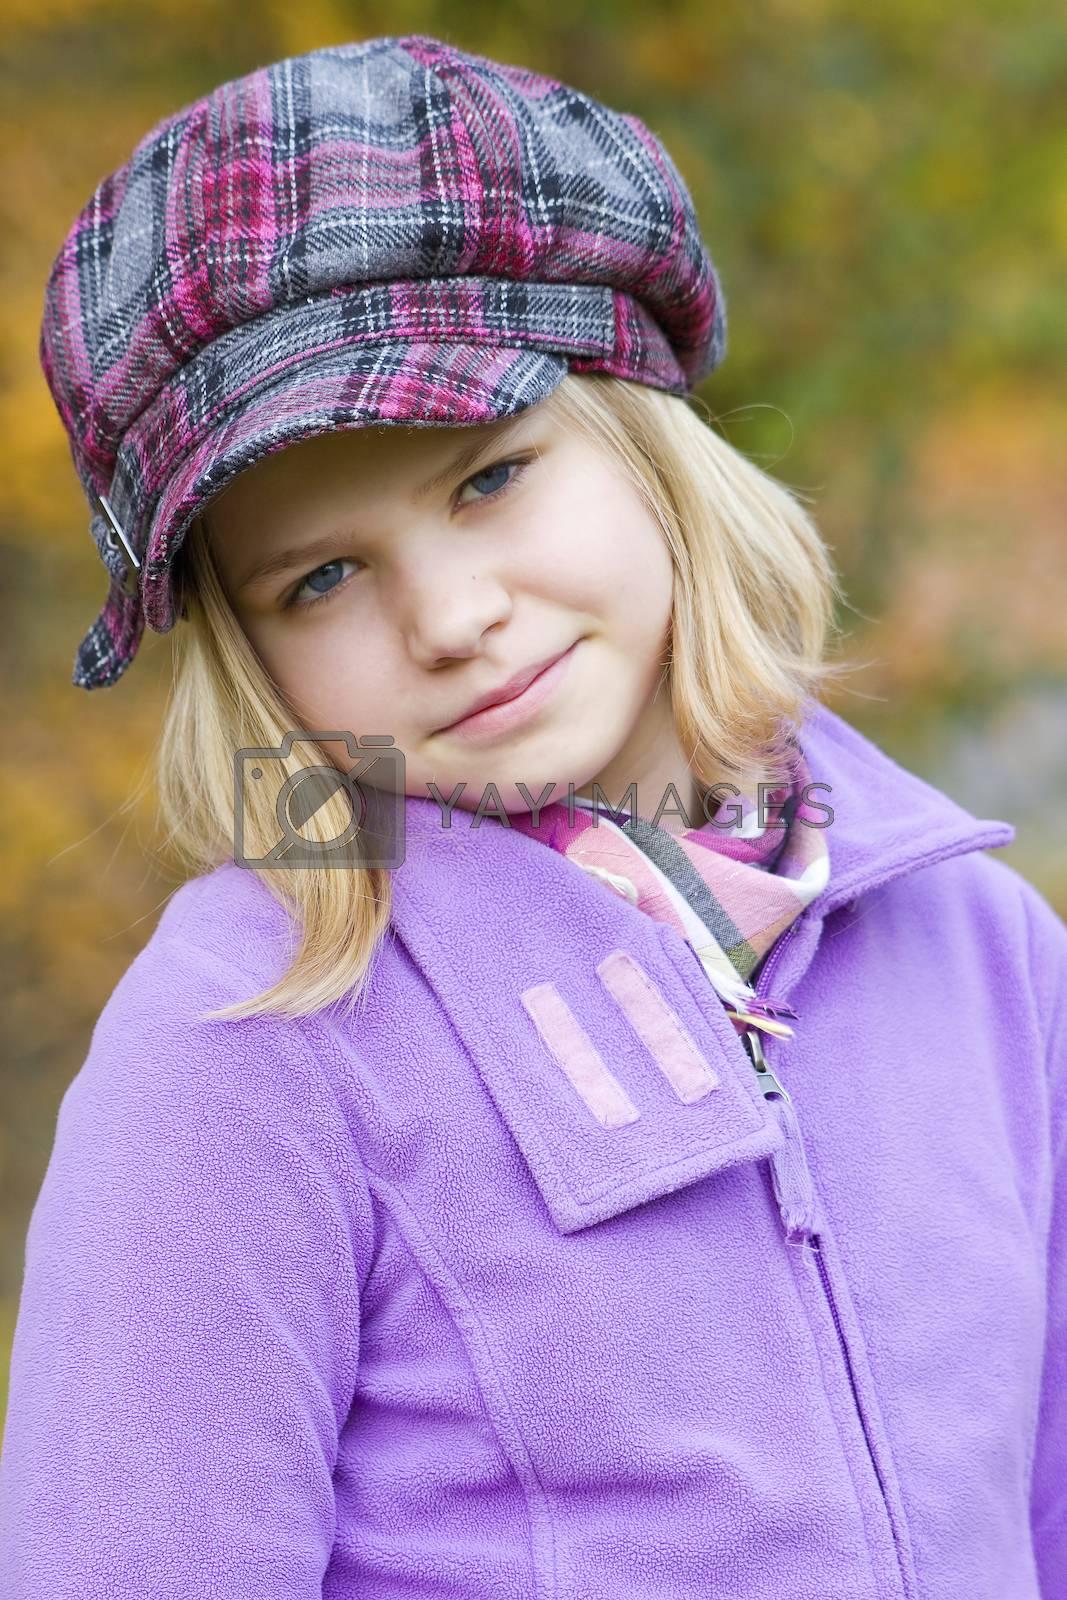 little girl - portrait by miradrozdowski